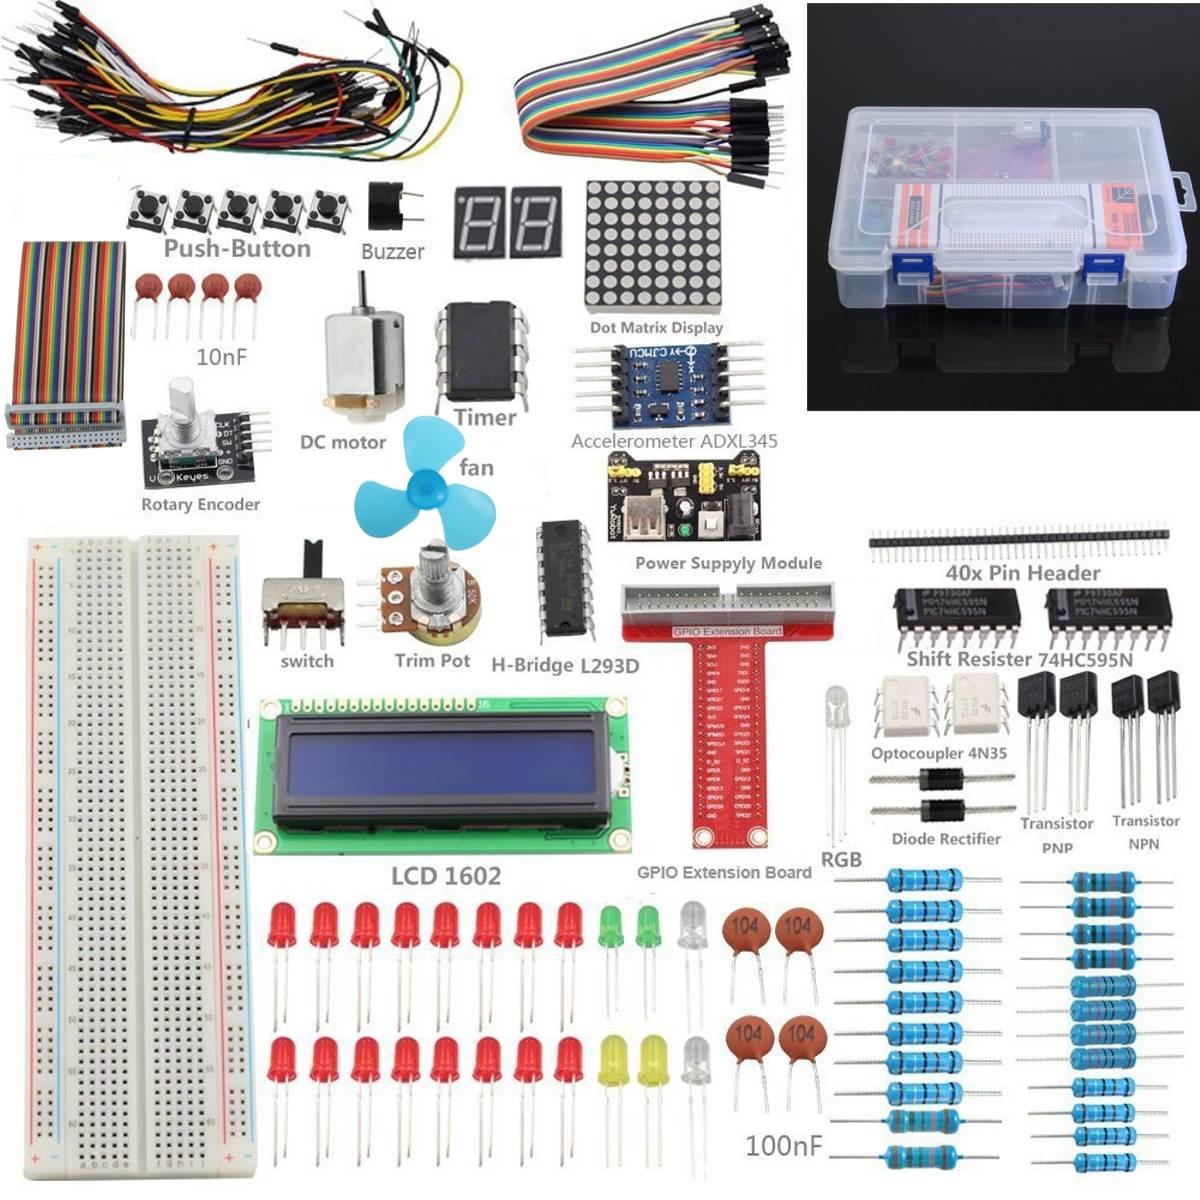 1Set Super Starter Kit for Raspberry Pi 3 2 Zero w wireless & Model B+ A+ интегральная микросхема oem 3 2 pi b 512m pi b 1 raspberry pi 2 set 3